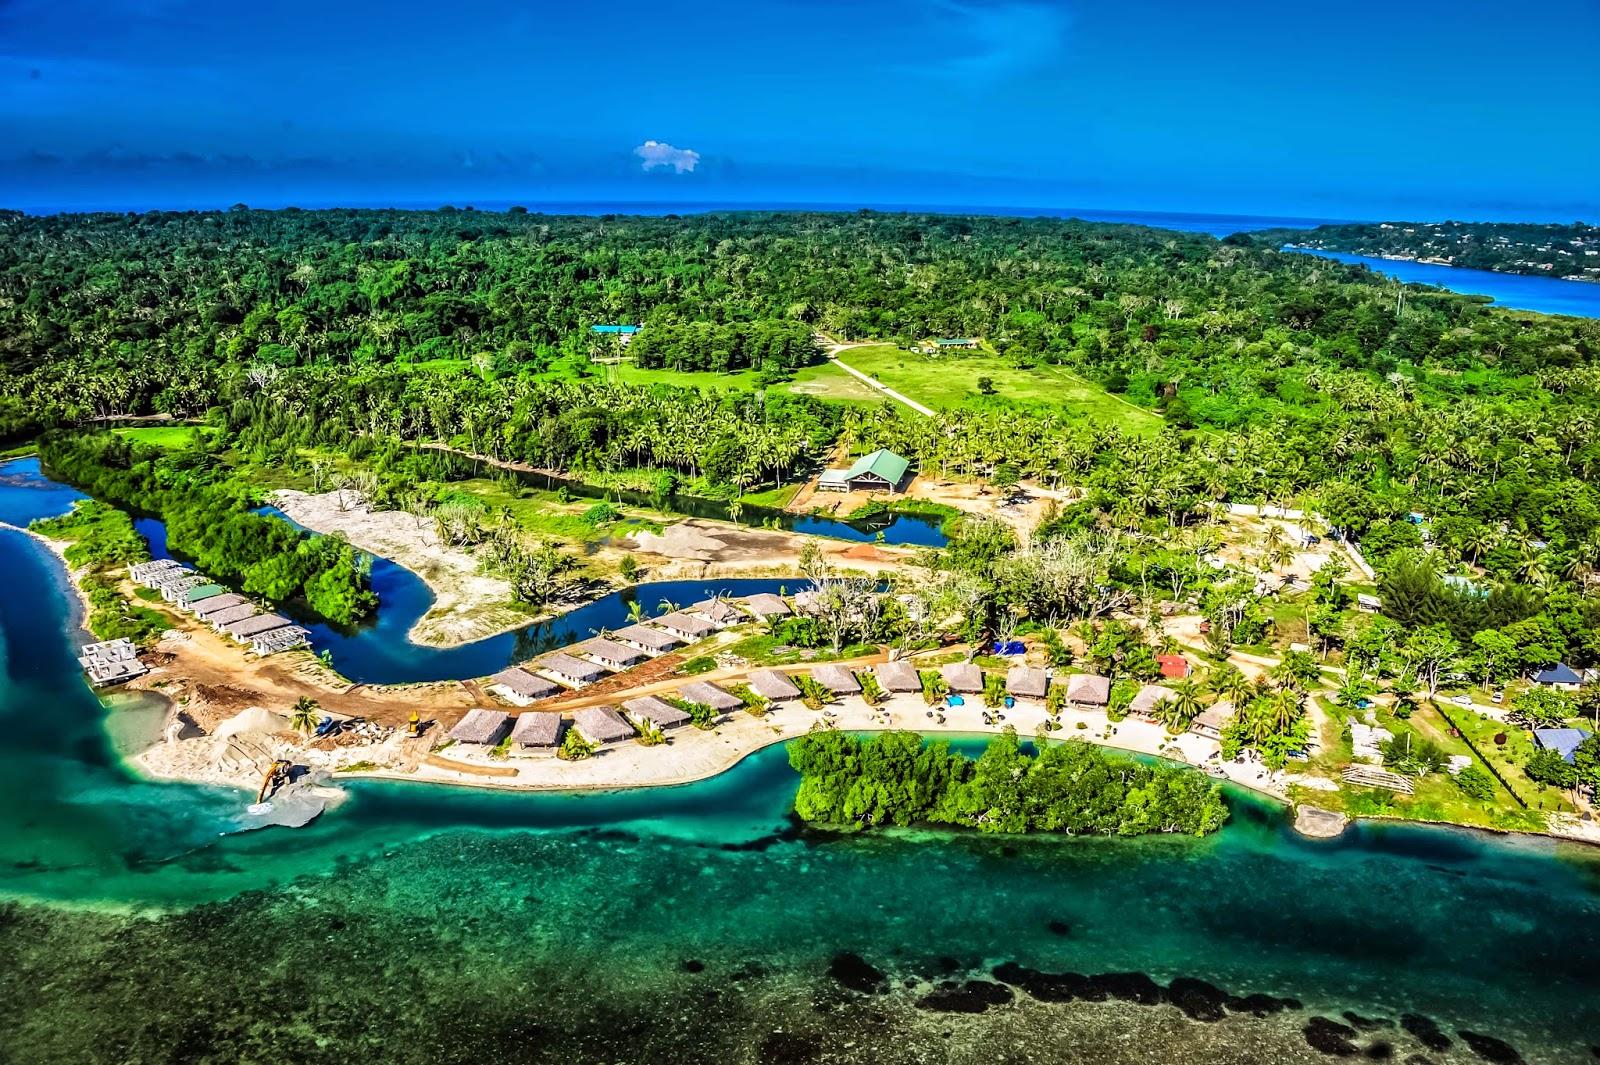 Картинки по запросу Tuvalu island